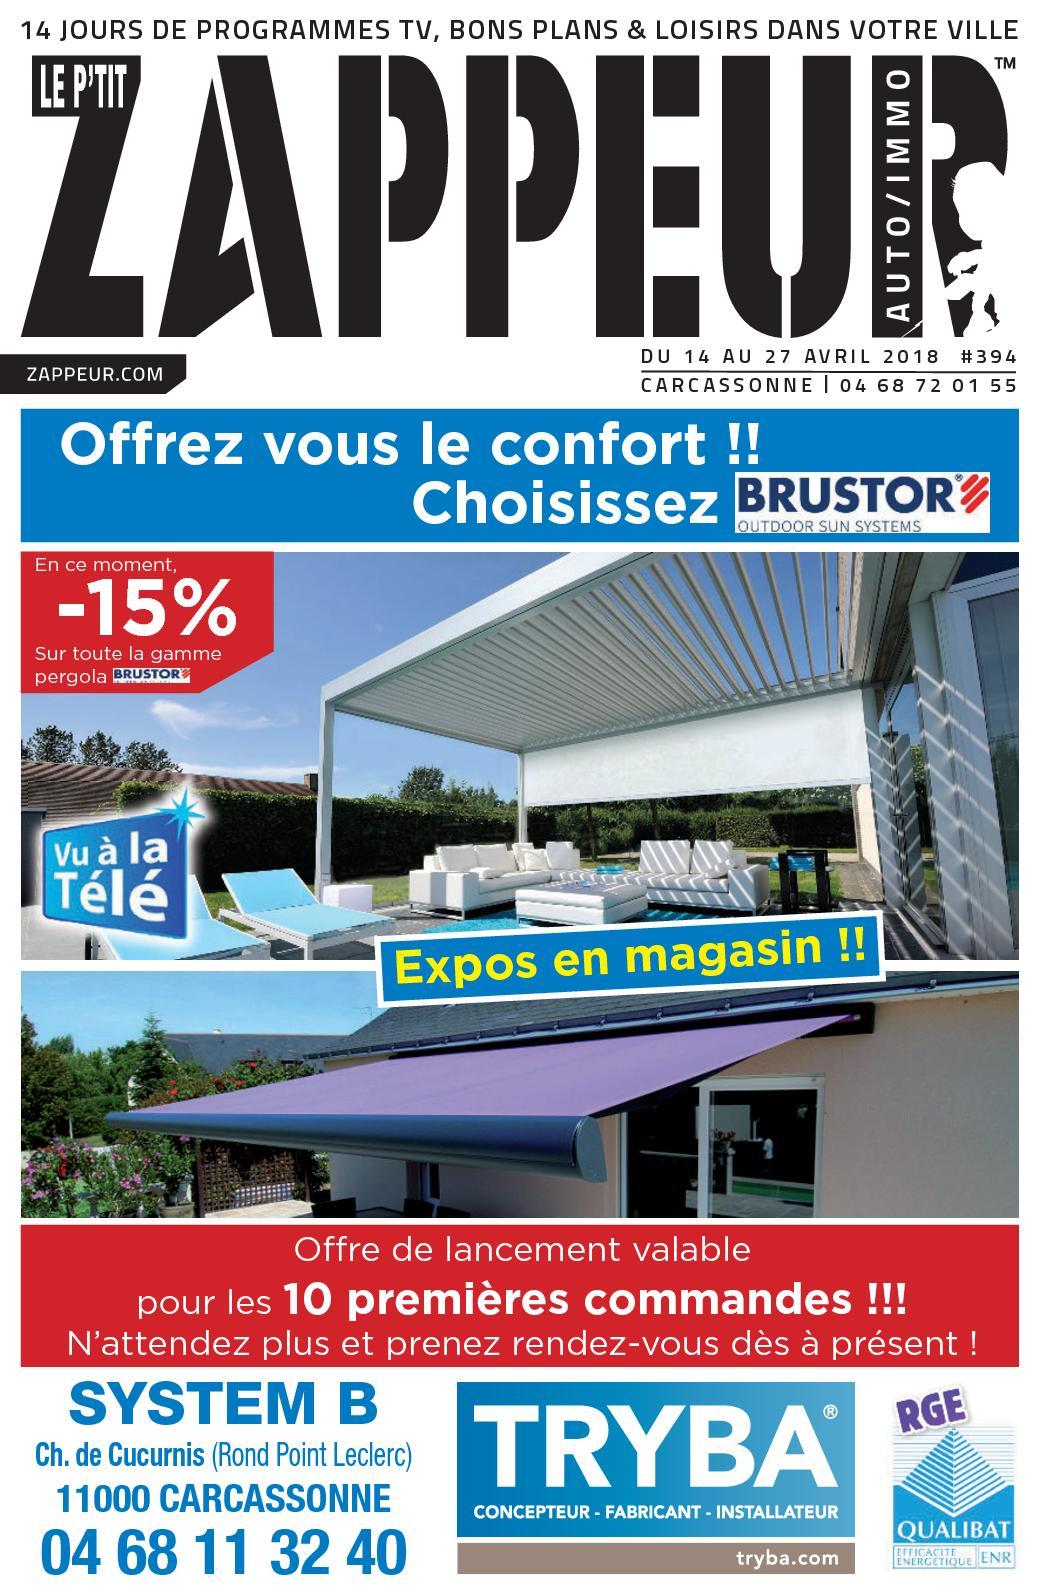 good service new images of competitive price Calaméo - Le P'tit Zappeur - carcassonne #394